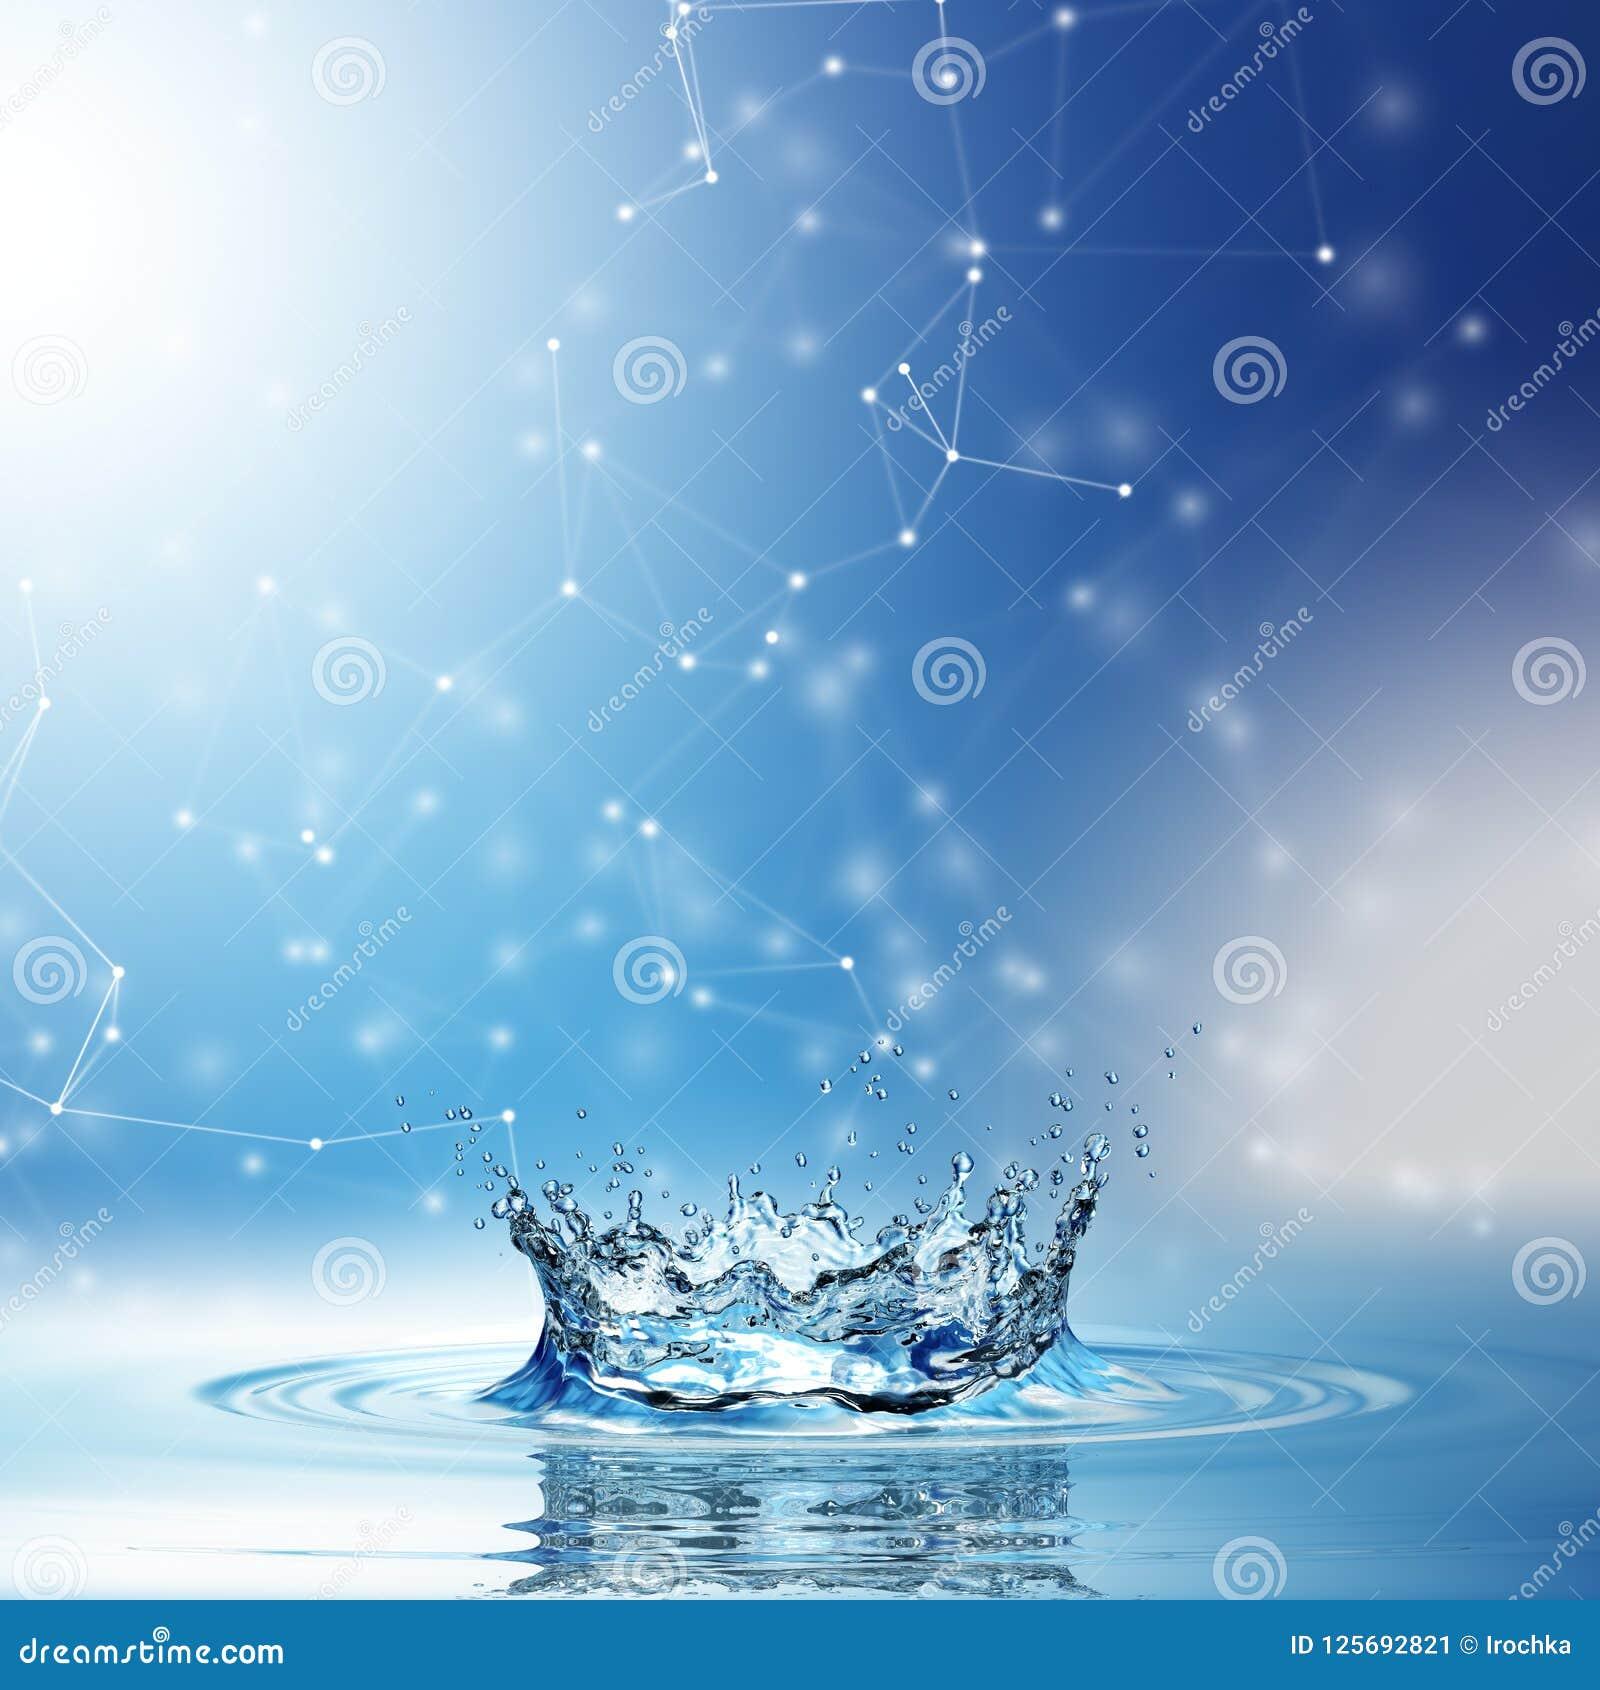 Download Blue Water Splash Isolated On White Background. Stock Illustration - Illustration of hygiene, motion: 125692821